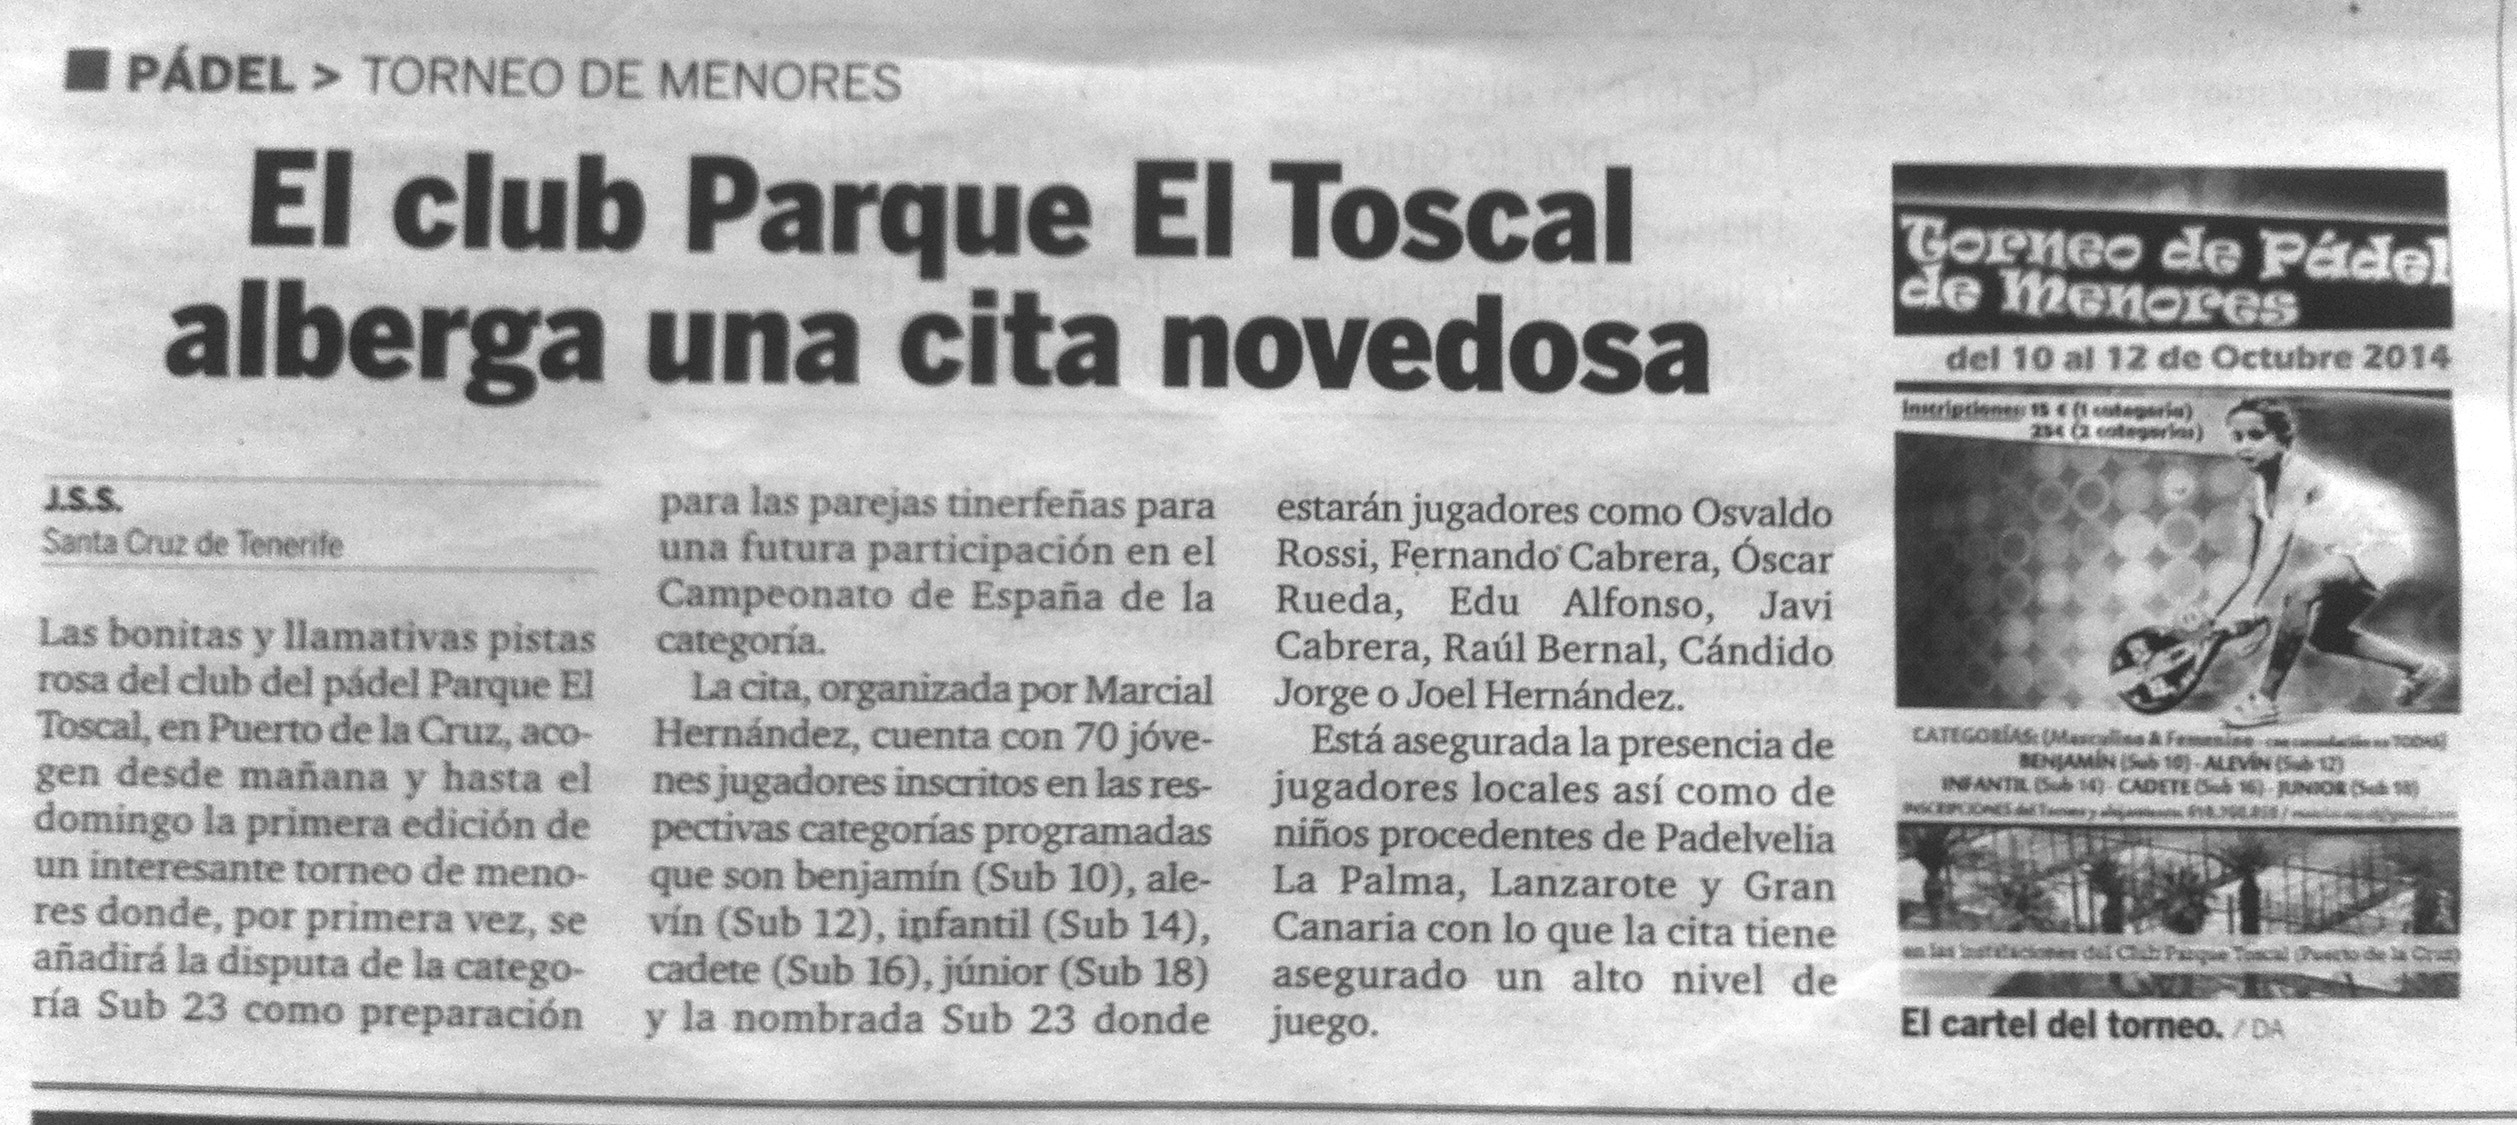 Noticias Prensa Archivos - mhmtenispadel.com - clases de tenis padel en Tenerife